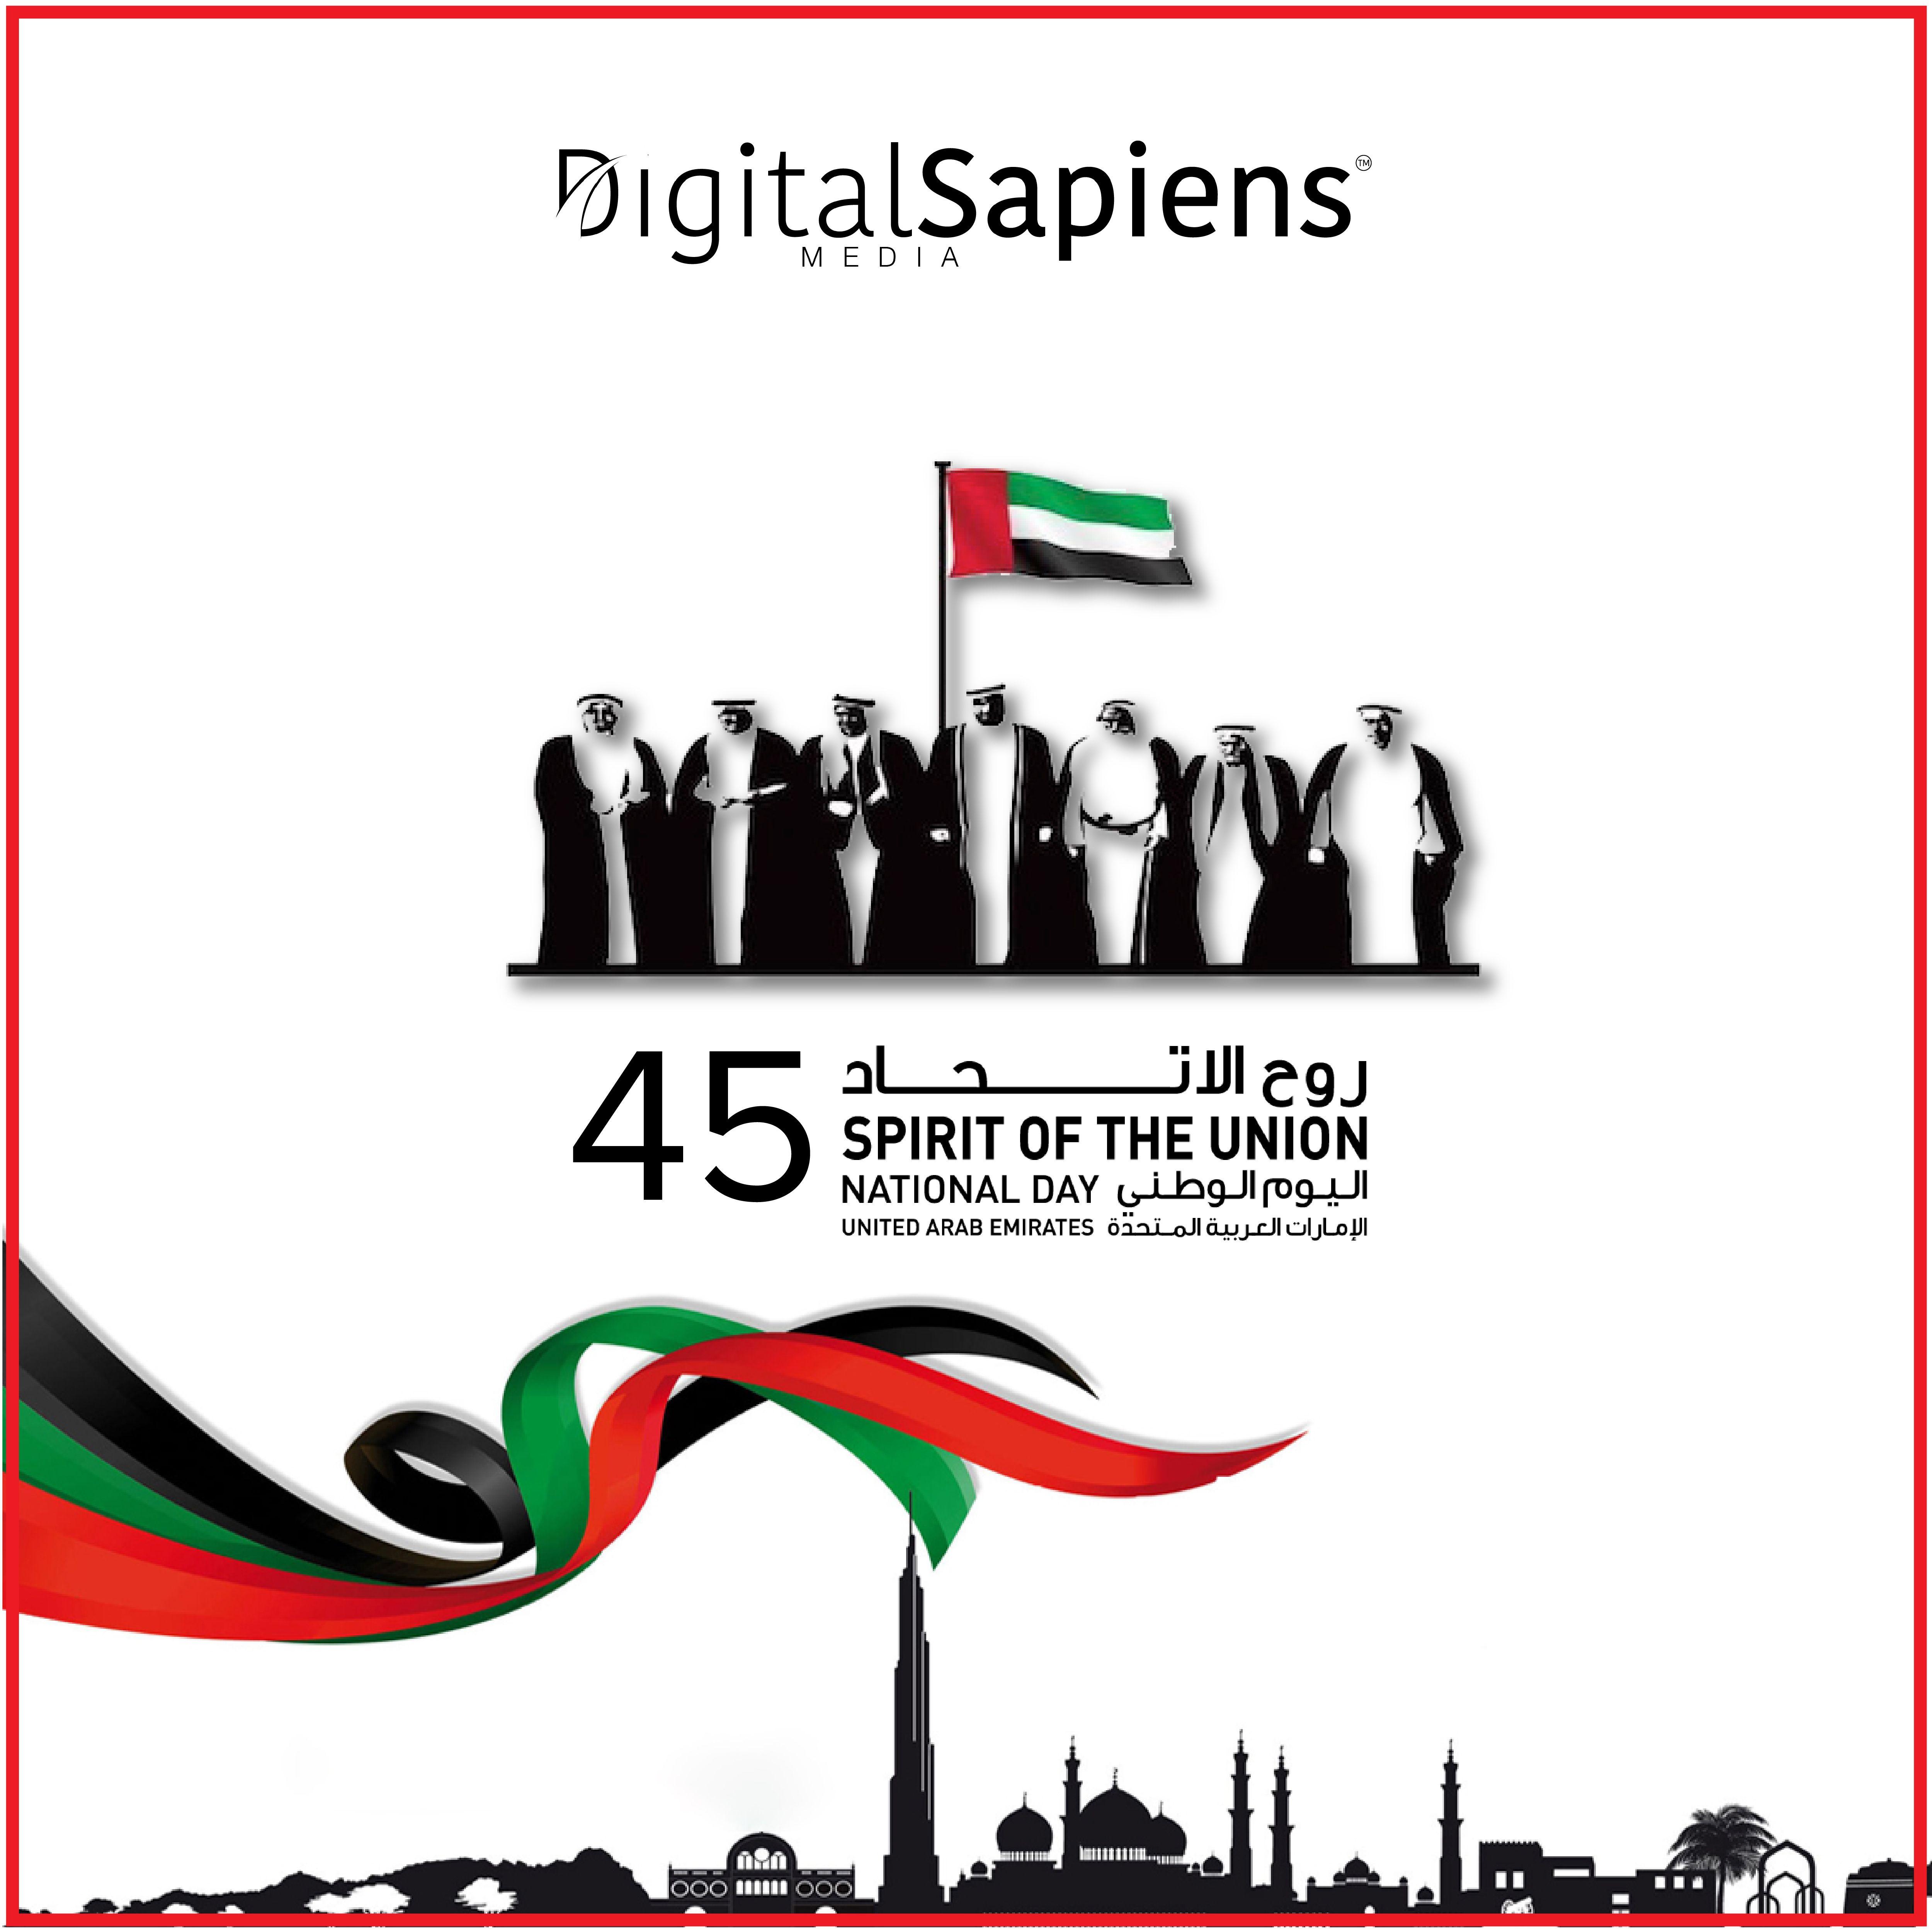 DigitalMediaSapiens wishes all residents of UAE a Happy